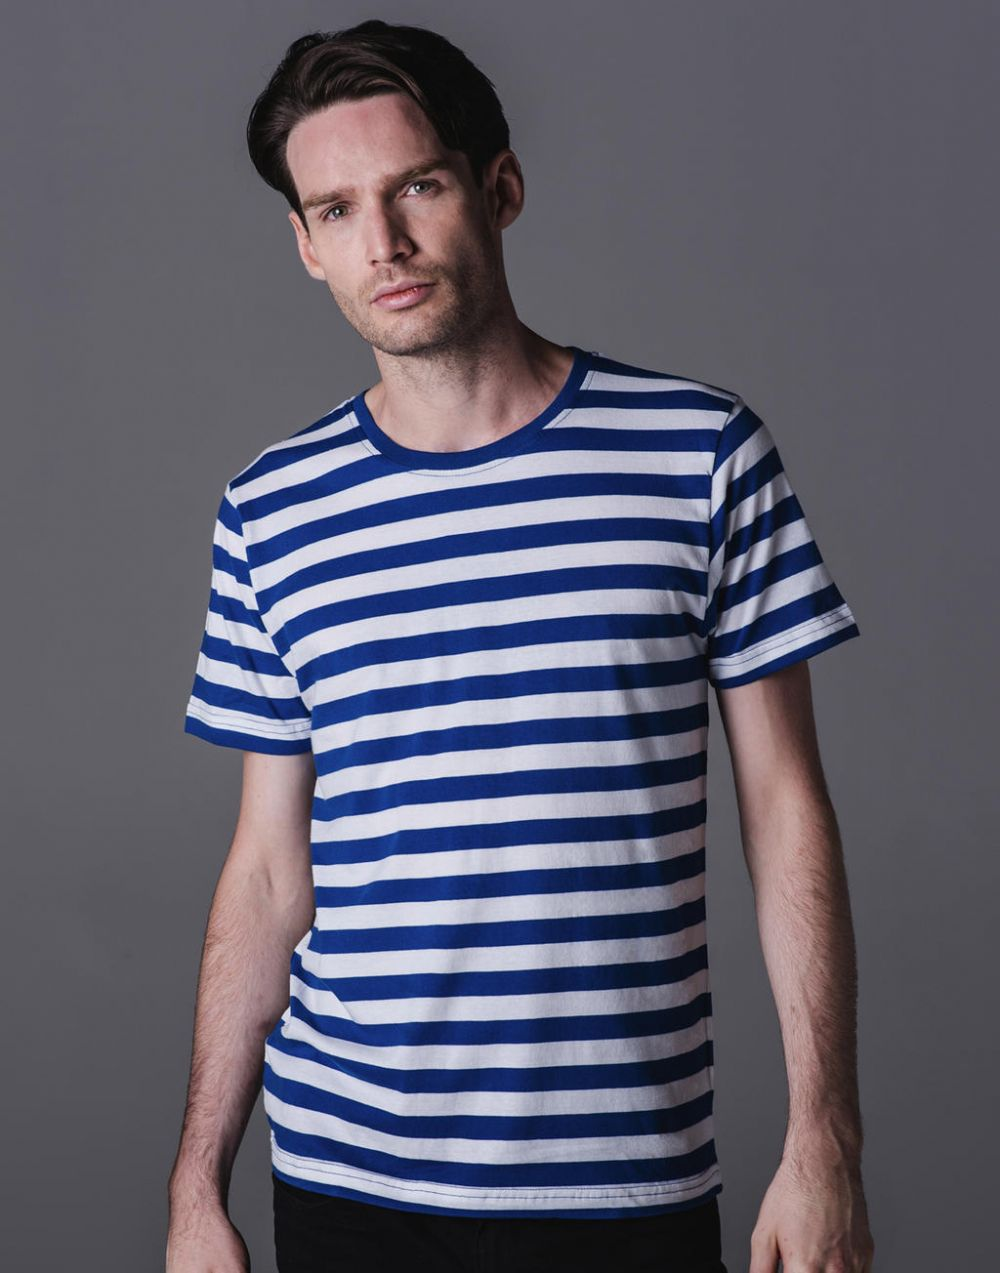 Camisetas manga corta mantis a rayas hombre para personalizar imagen 2